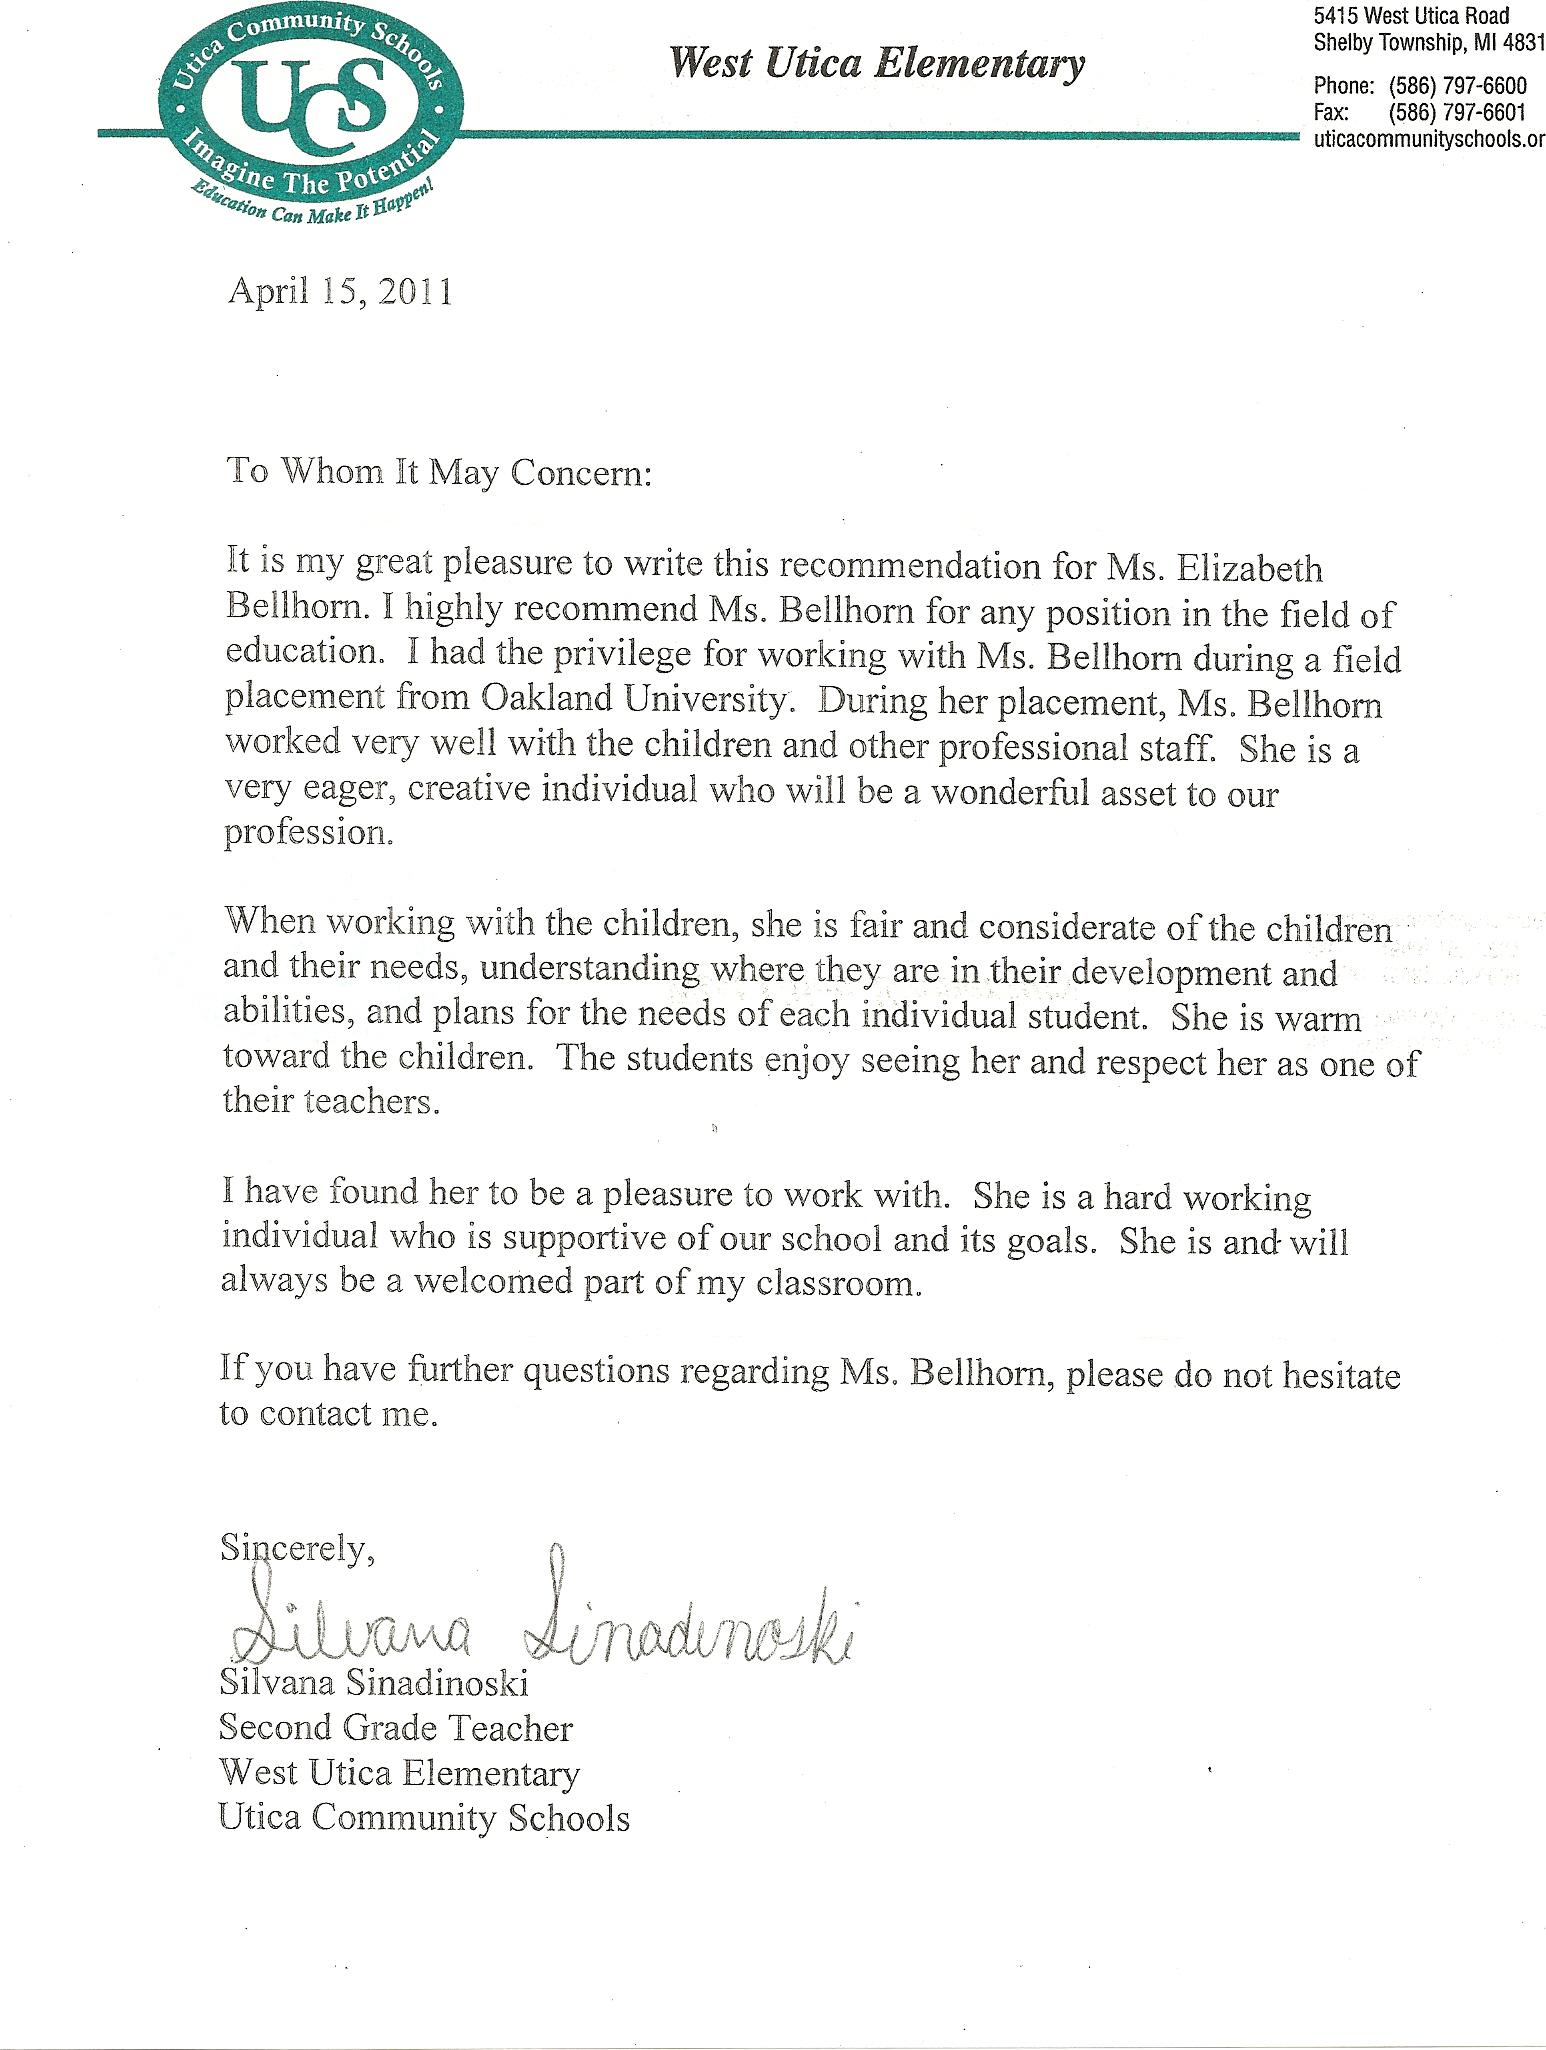 letter of recommendation for elementary student teacher from cooperating teacher